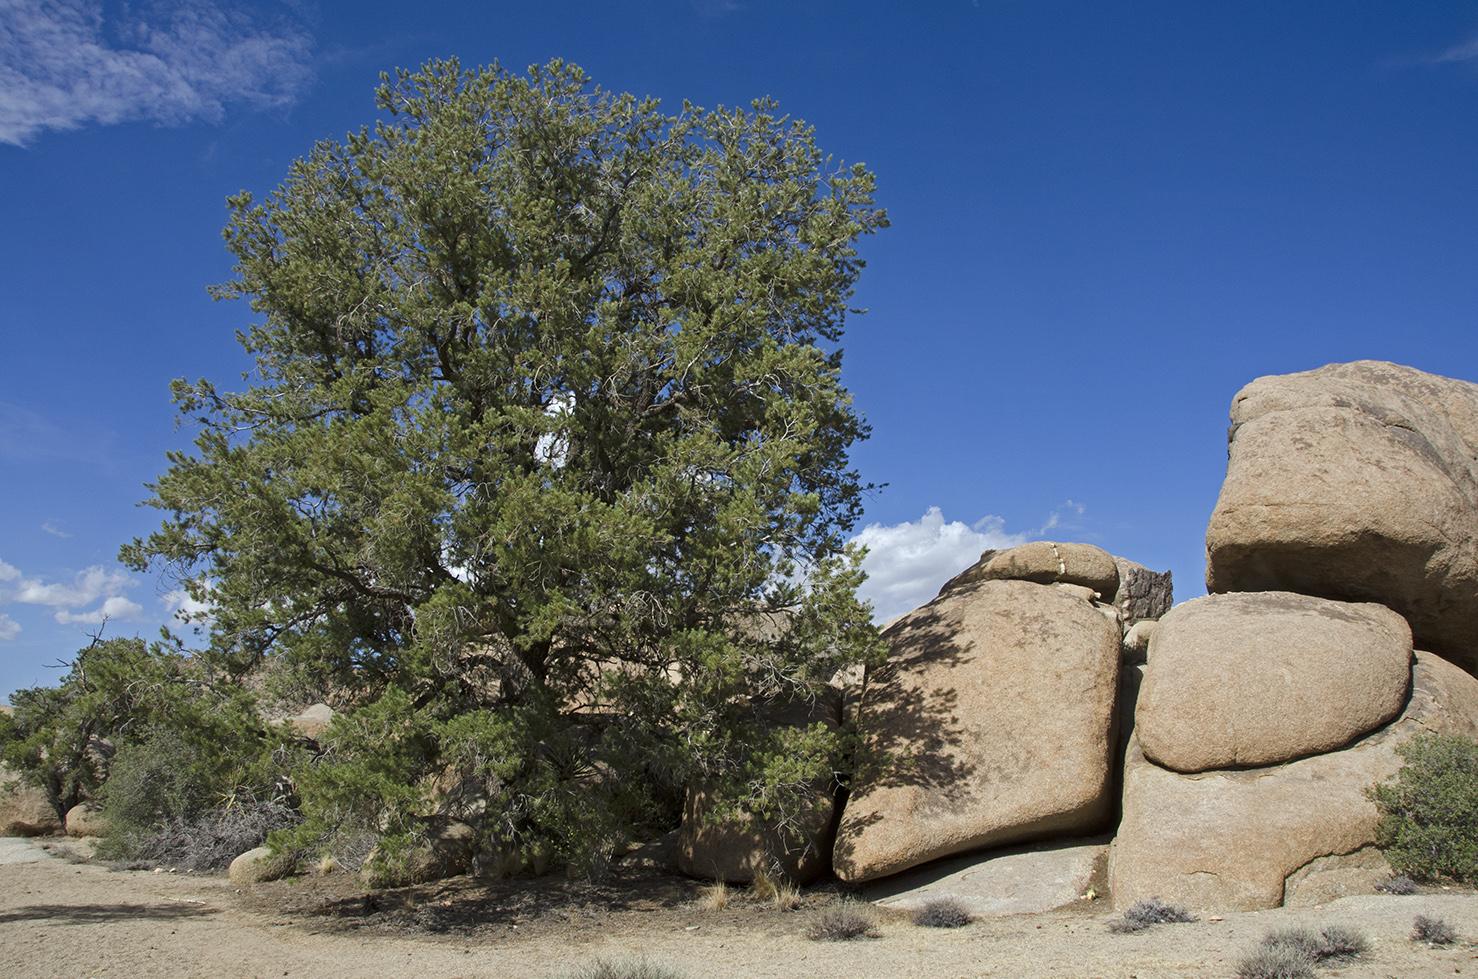 The largest Pinyon pine at Pine City.